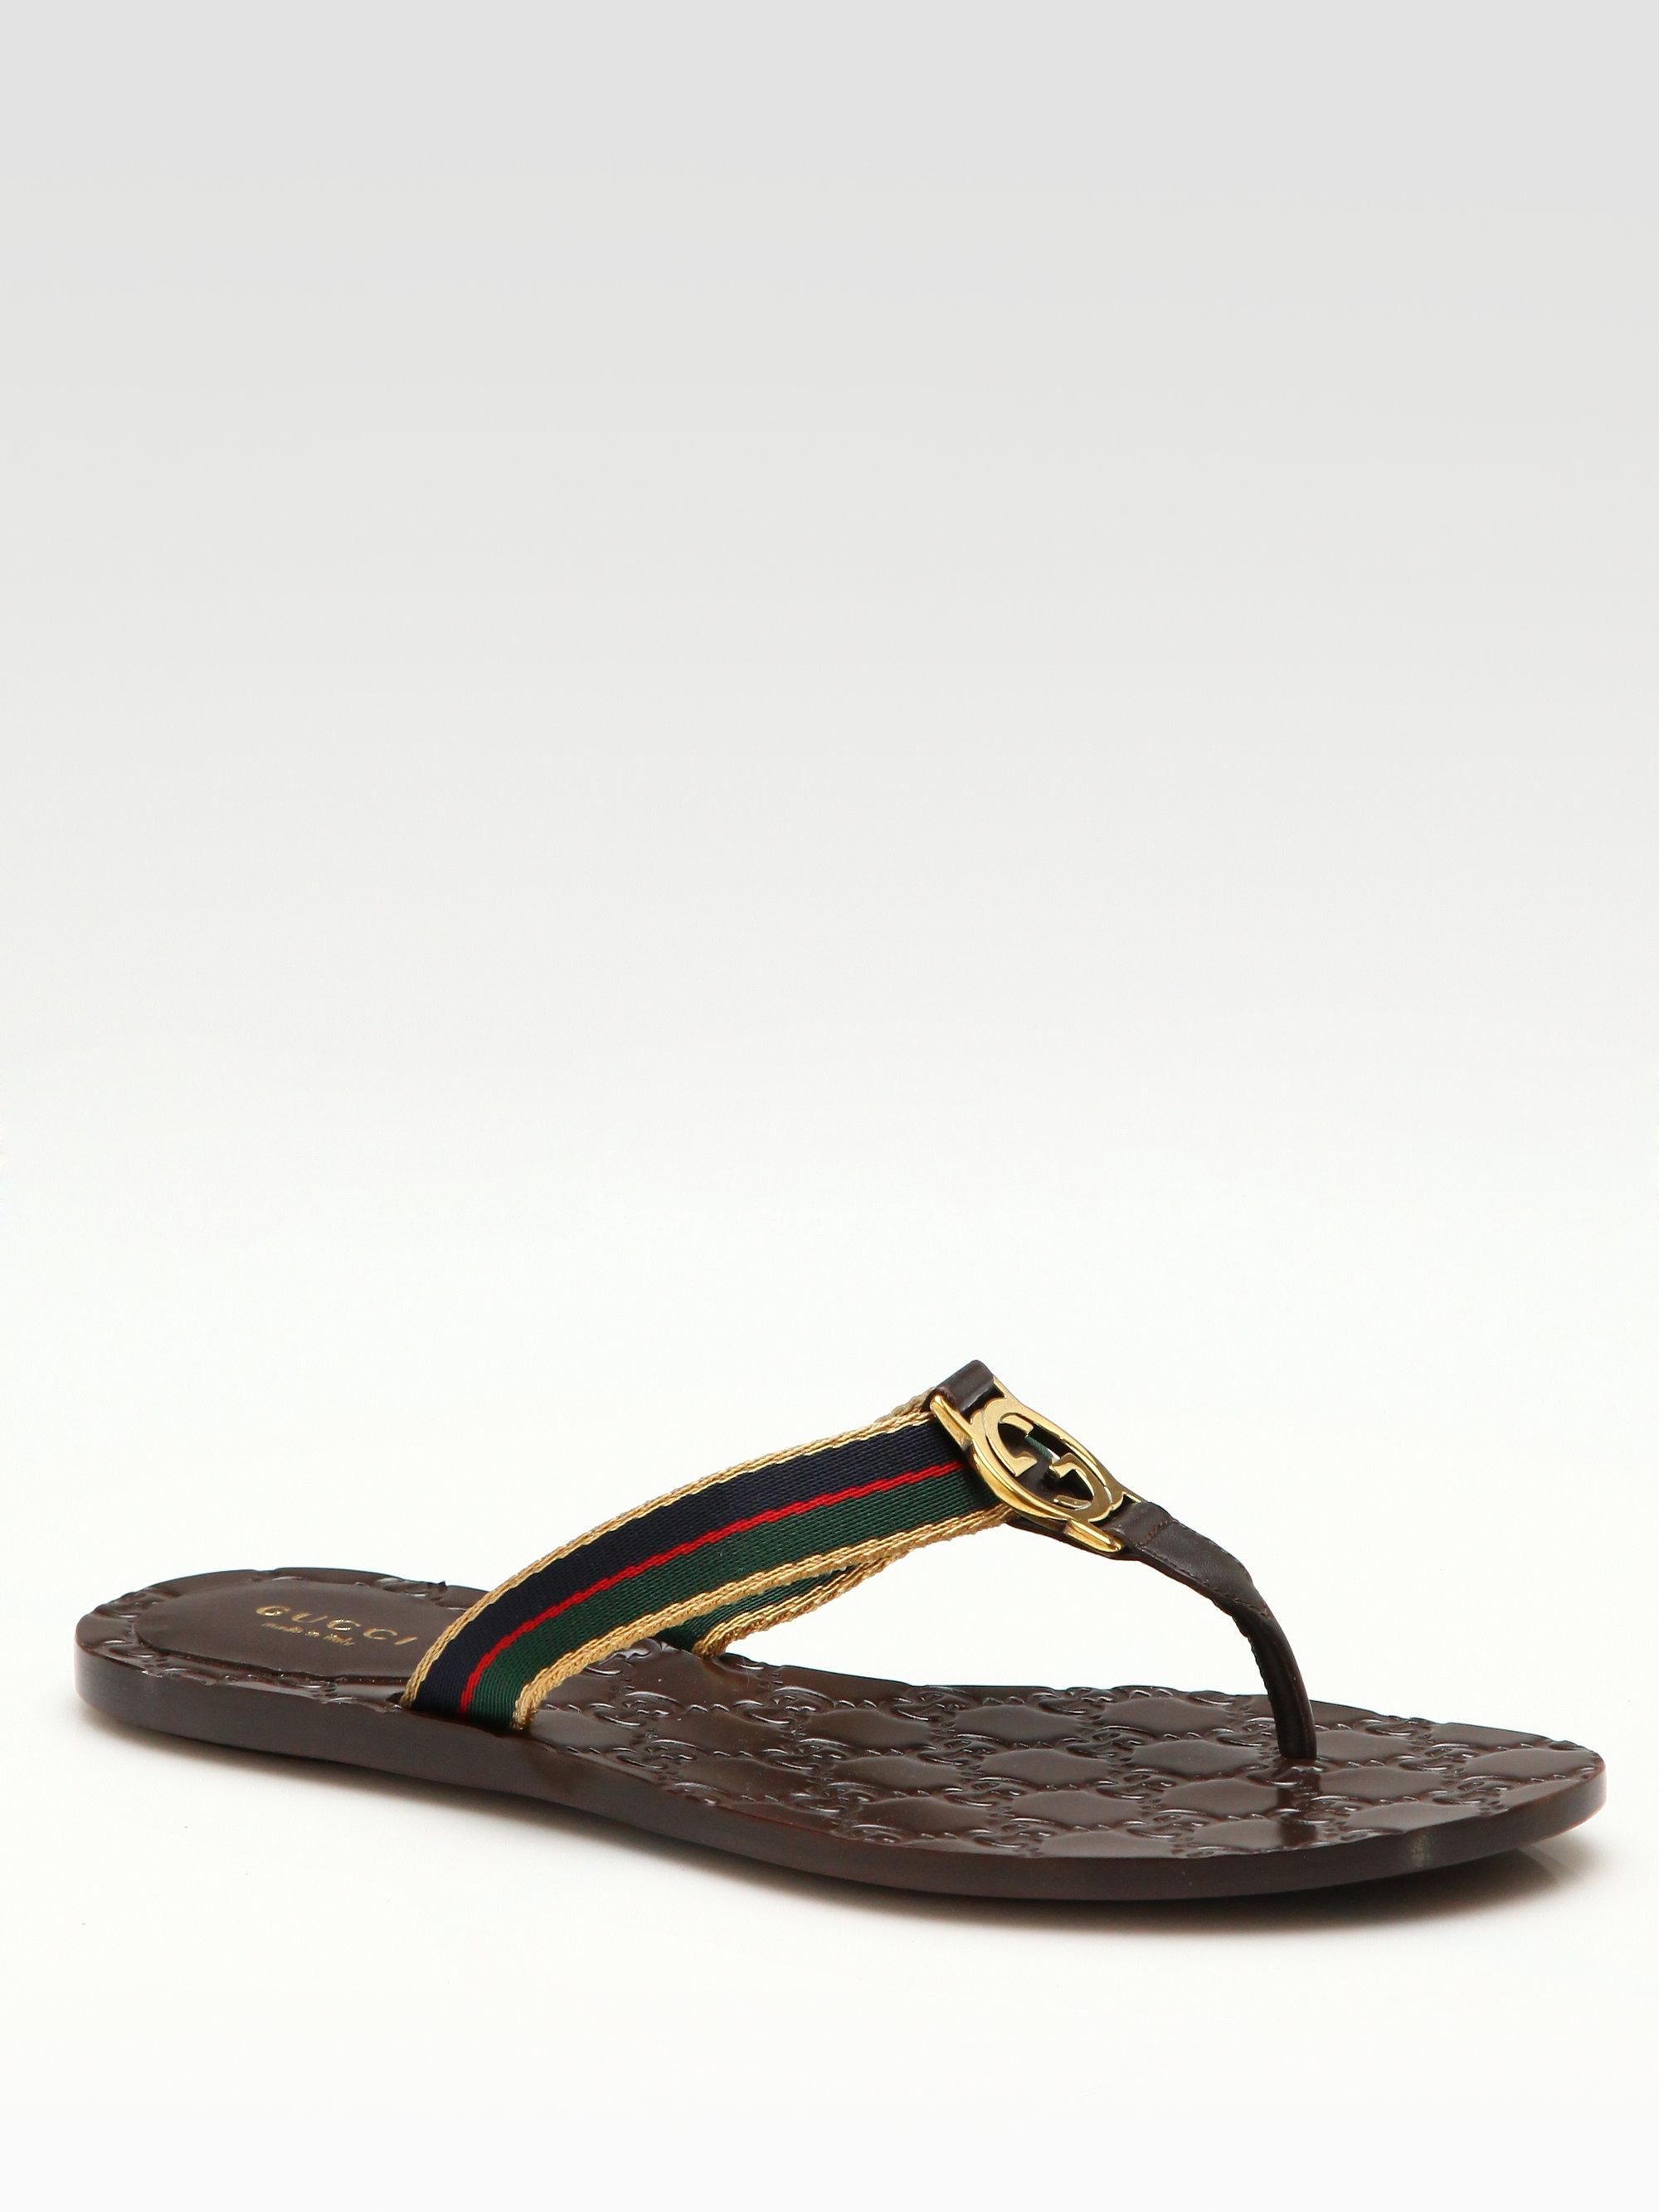 008cbf387e4 Lyst - Gucci Gg Thong Sandals in Brown